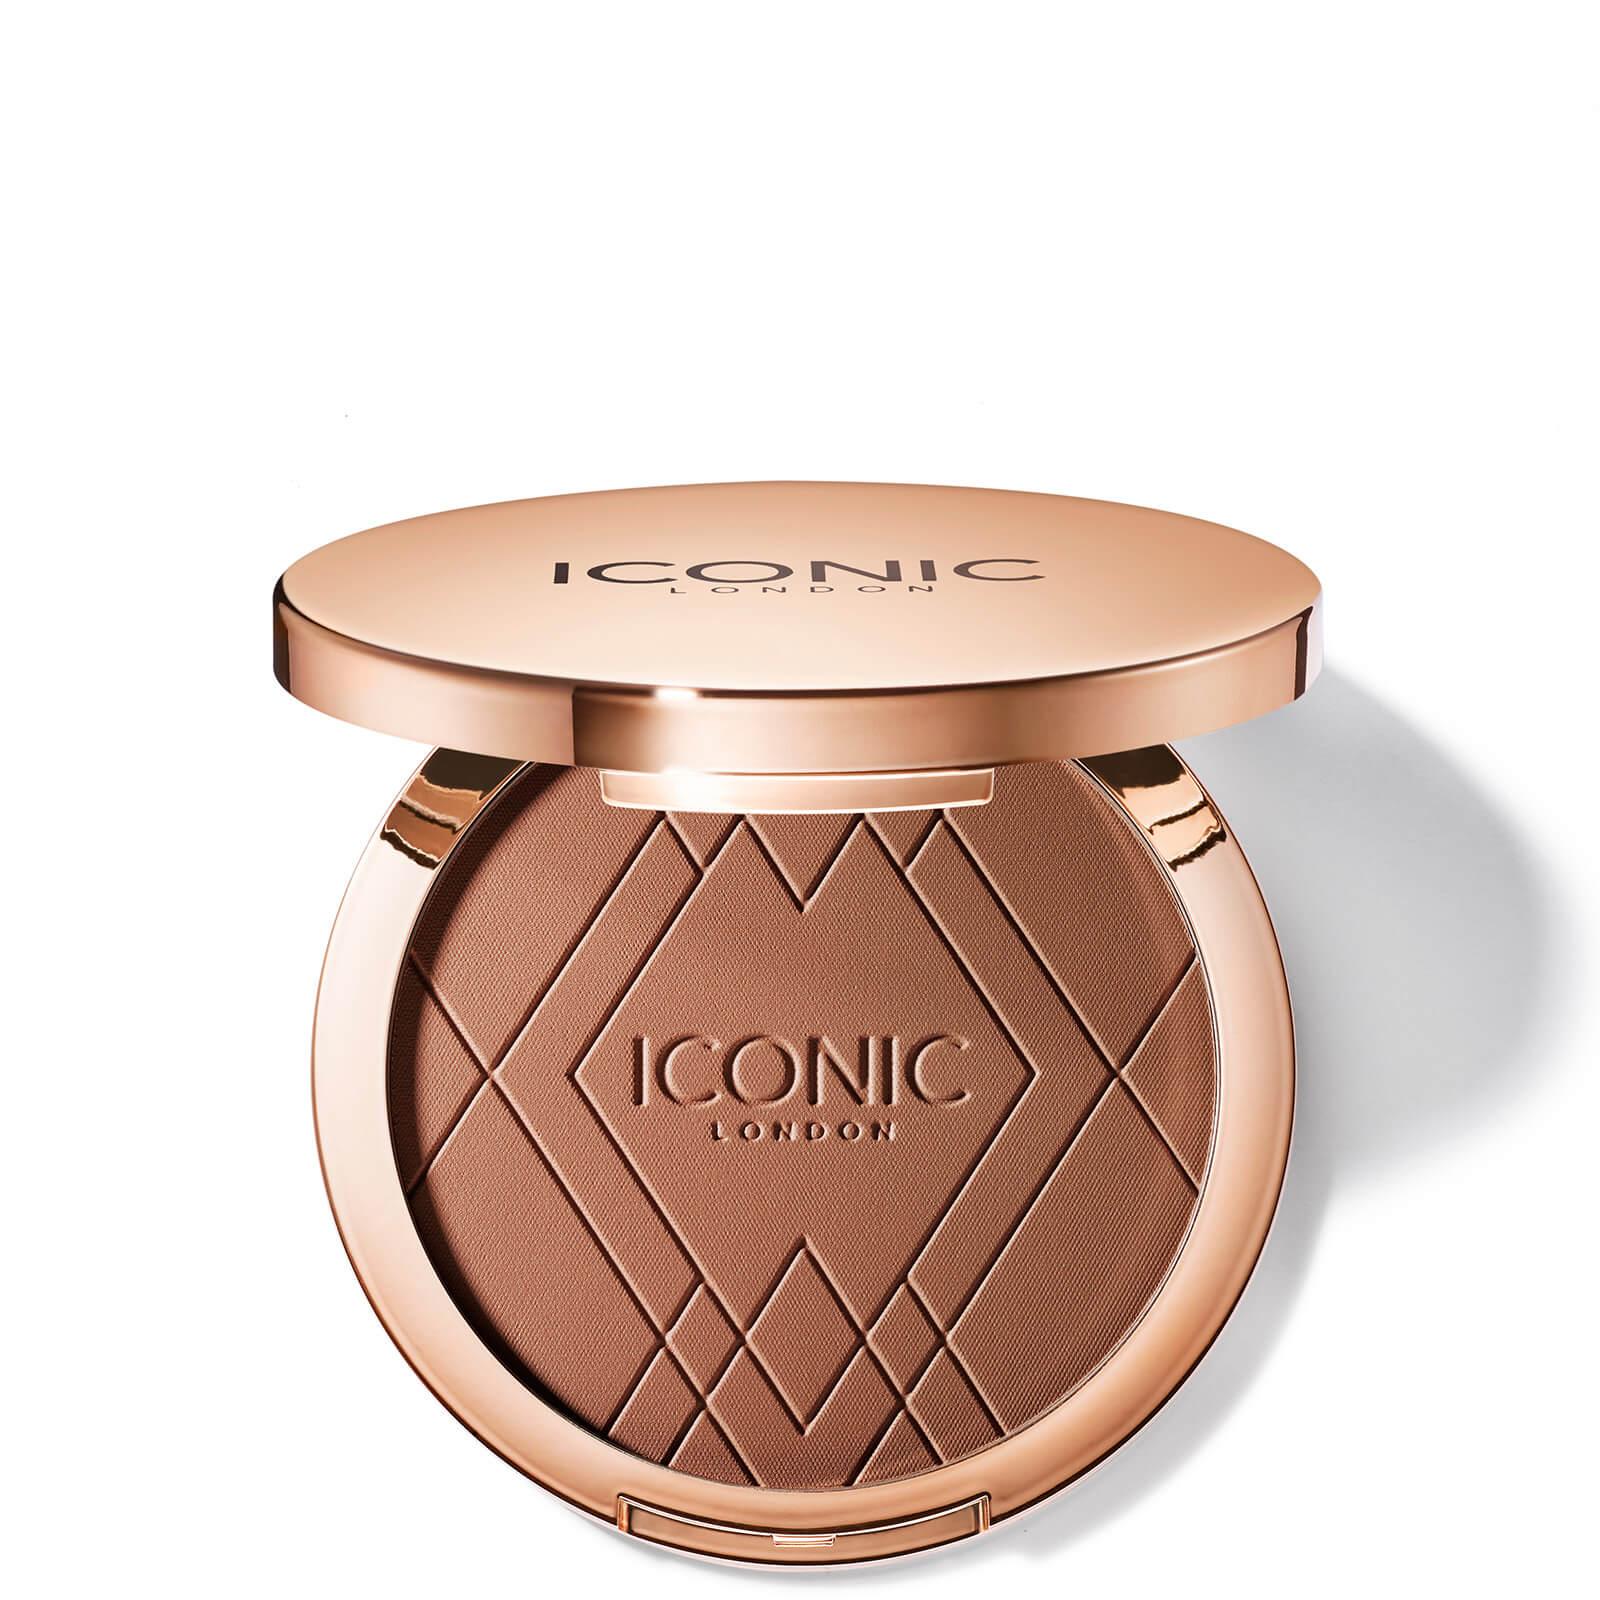 ICONIC London Ultimate Bronzing Powder 17g (Various Shades) - Deep Bronze  - Купить